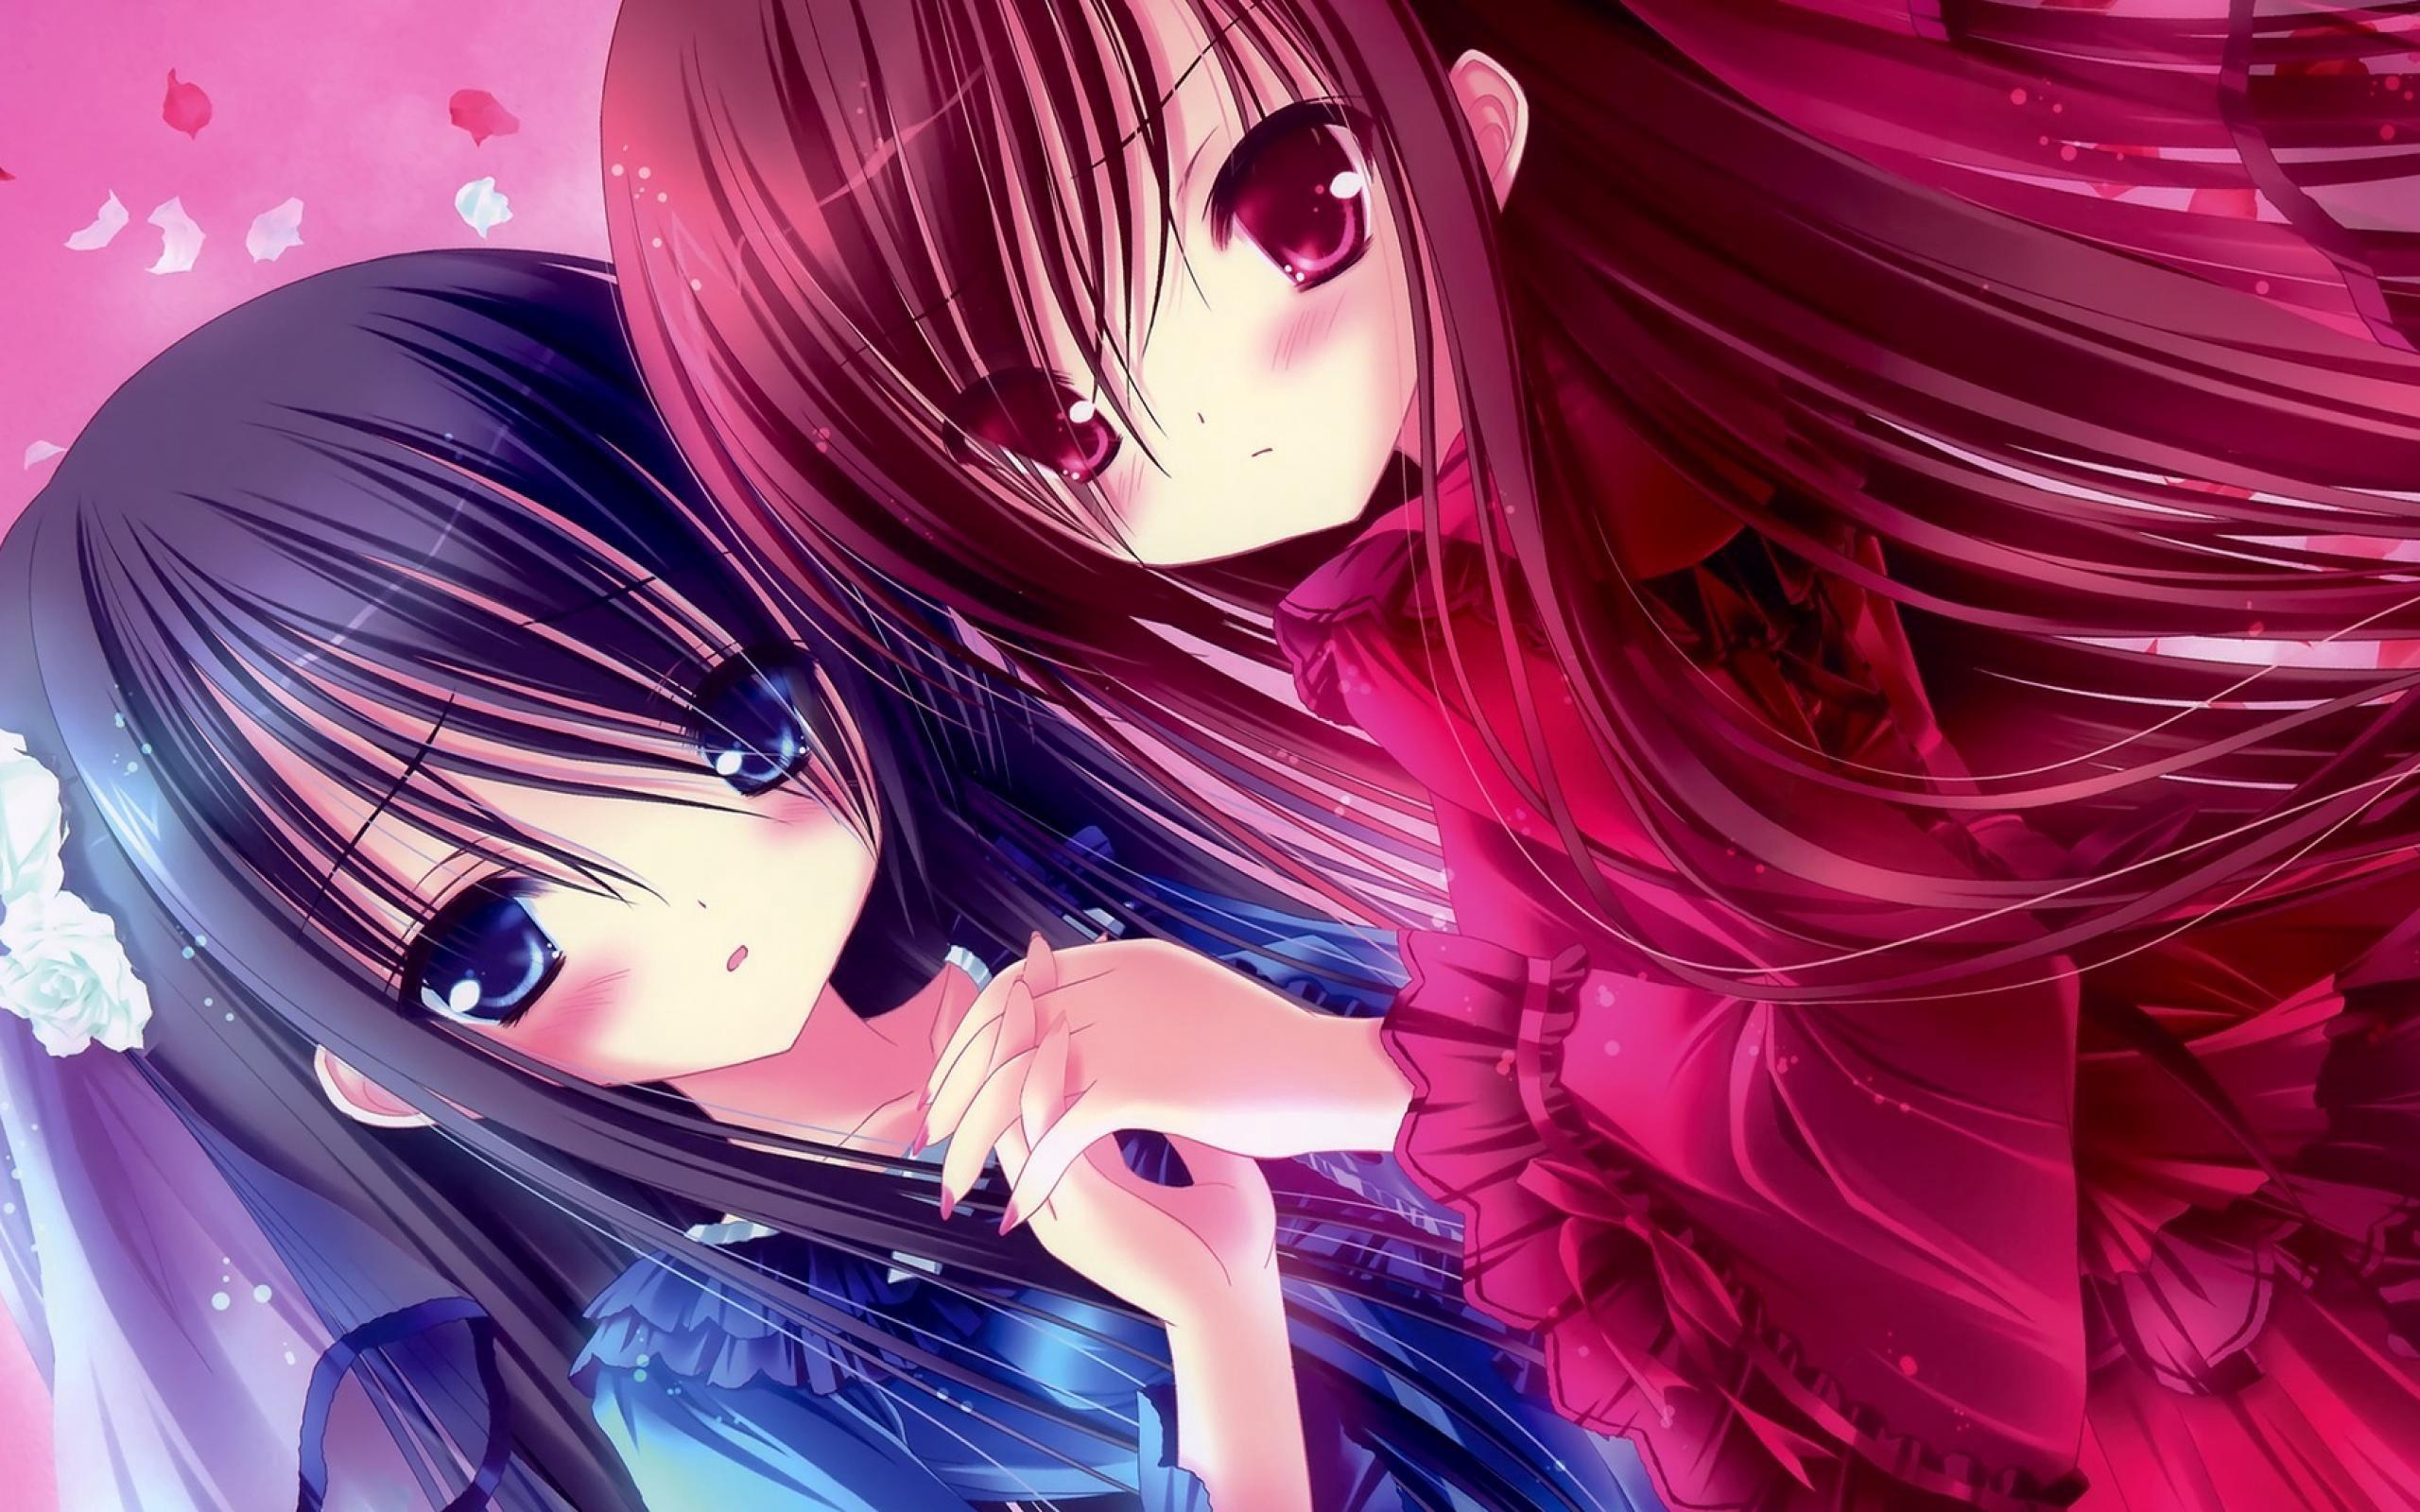 Wallpaper Kawaii, Anime, Girl, Friend, Person - Kawaii Anime Girls 3 - HD Wallpaper